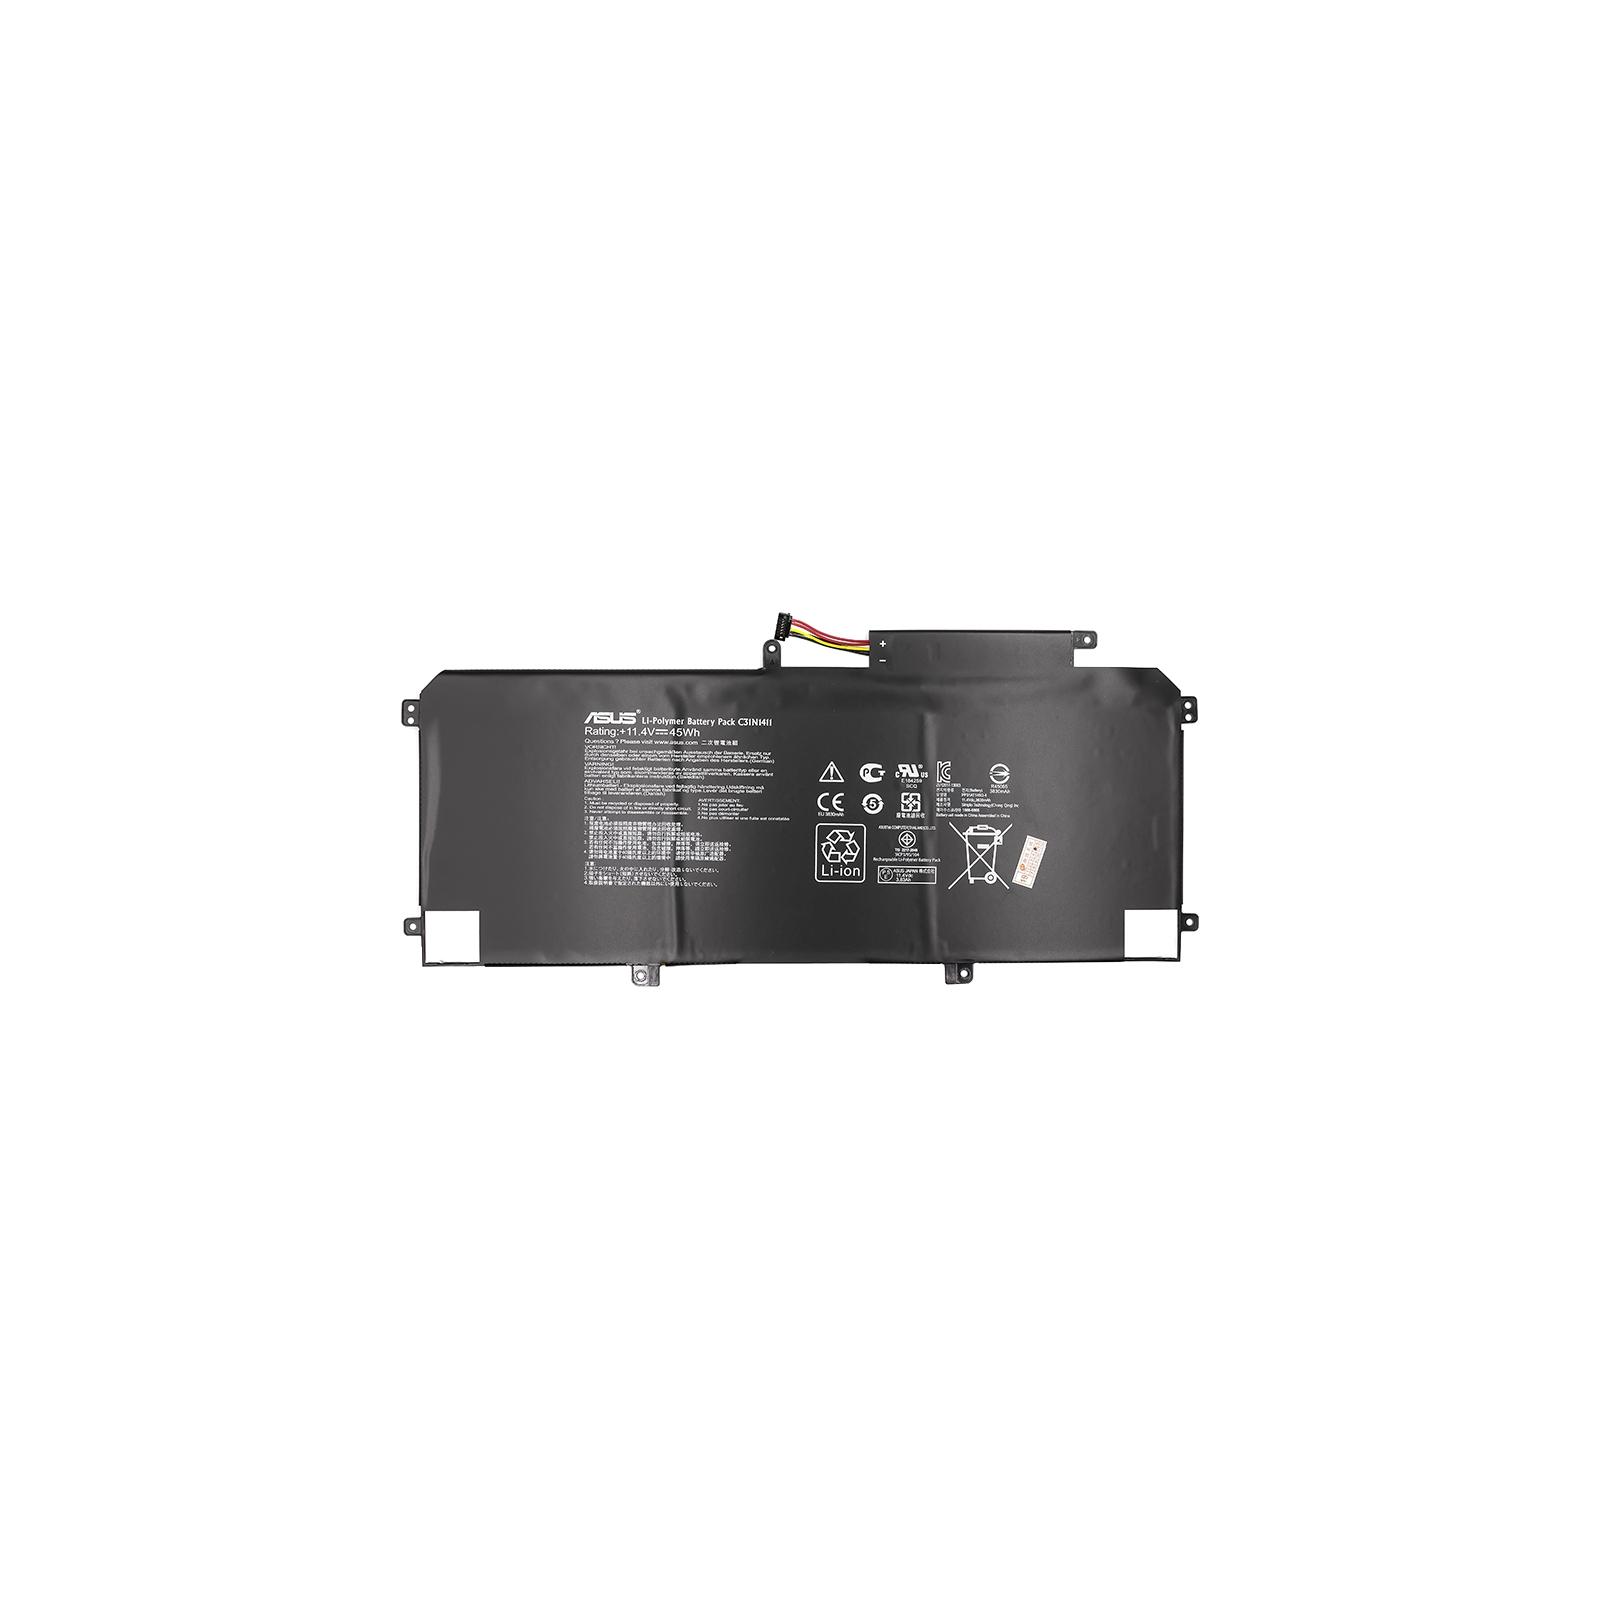 Аккумулятор для ноутбука ASUS Zenbook UX305 (C31N1411) 11.4V 45Wh (NB430901) изображение 2